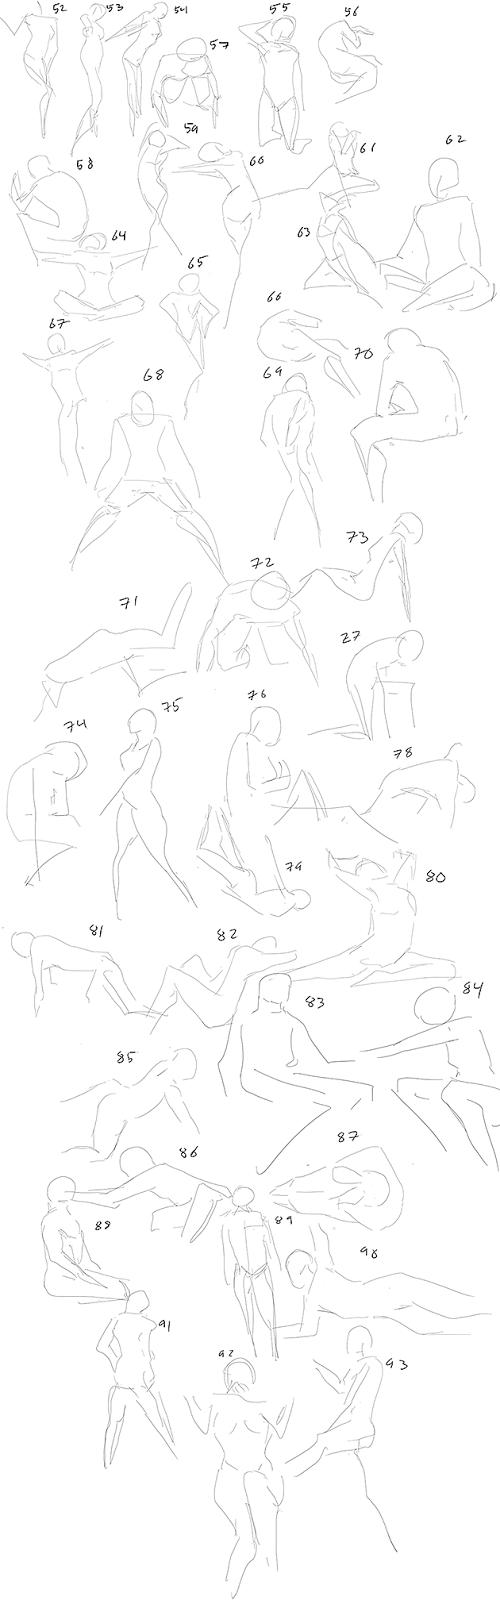 [Image: Gestures_15.png]